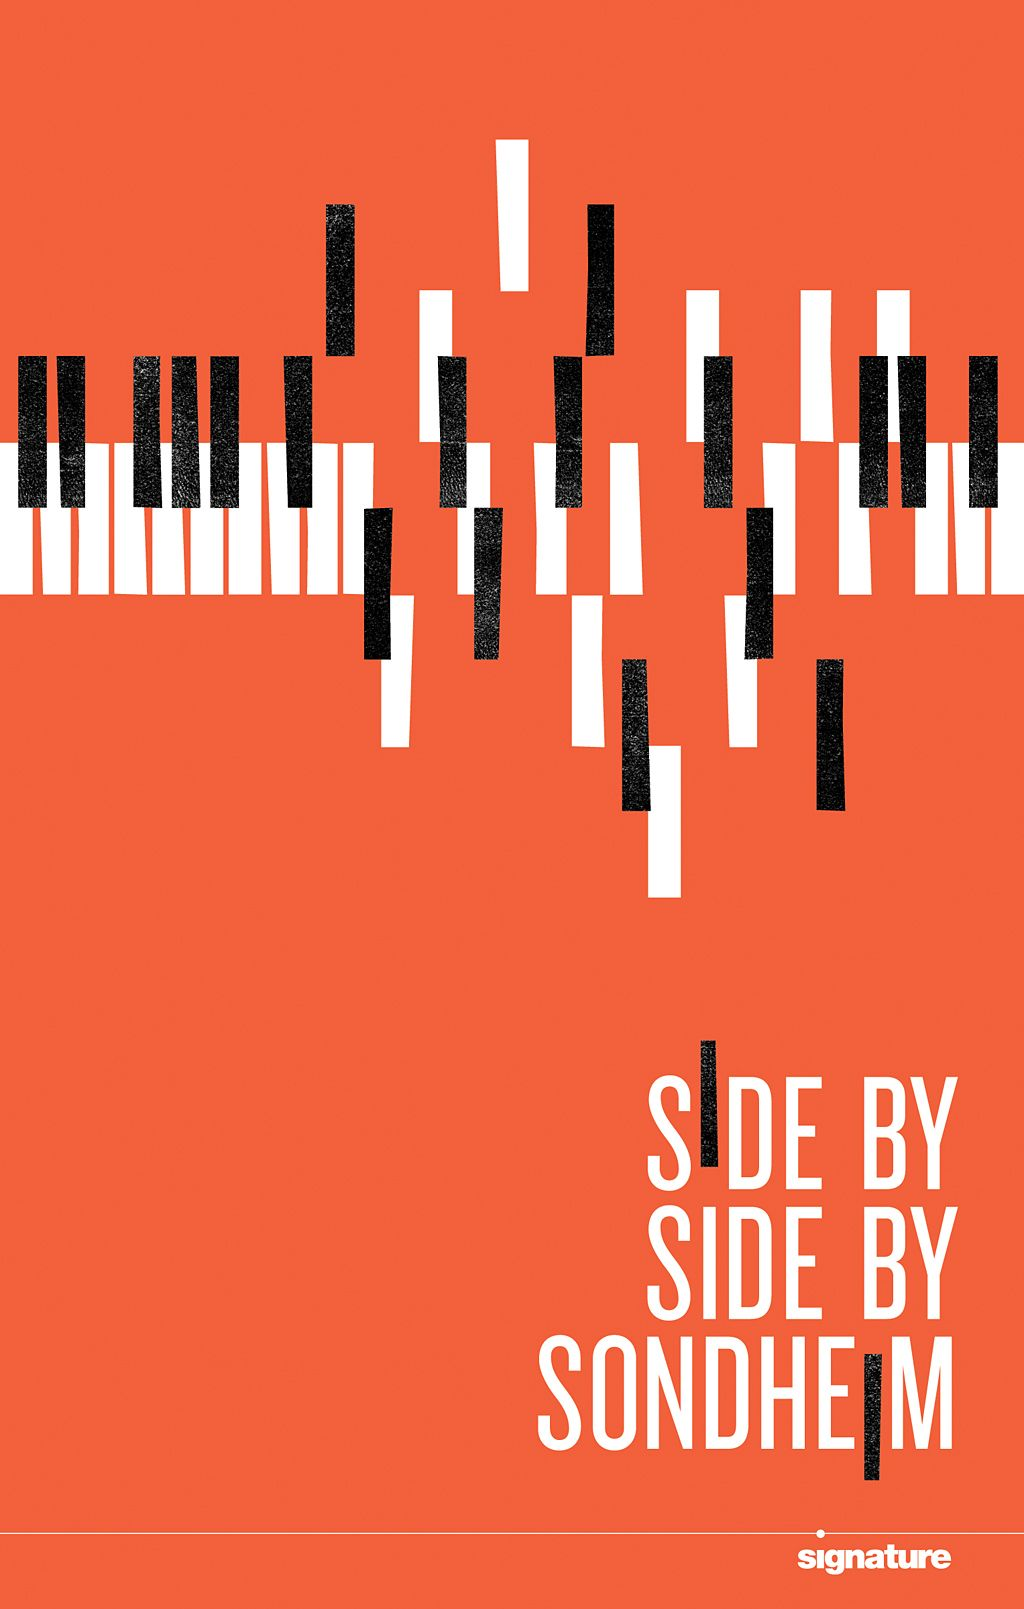 Poster design illustrator - Design Army Side By Side By Sondheim Poster And Illustration Design